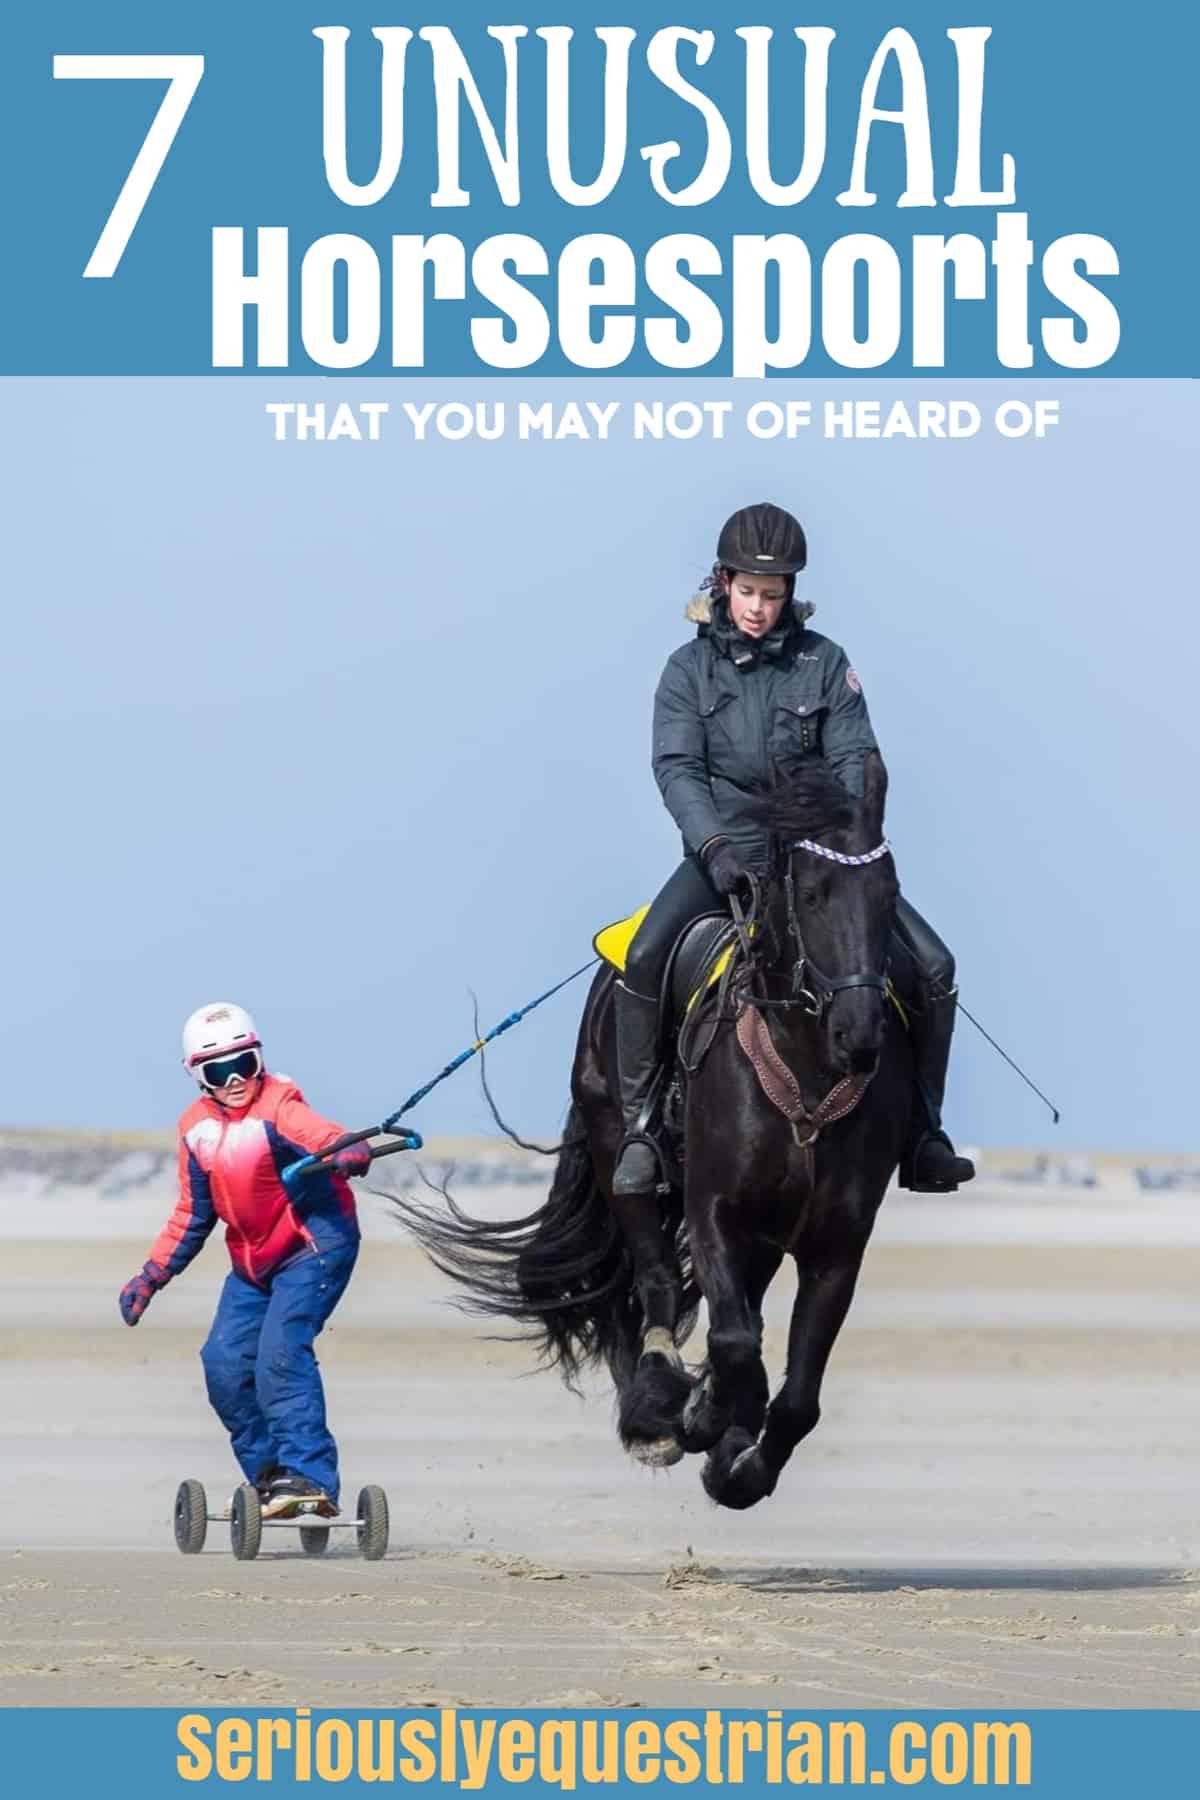 horsesports